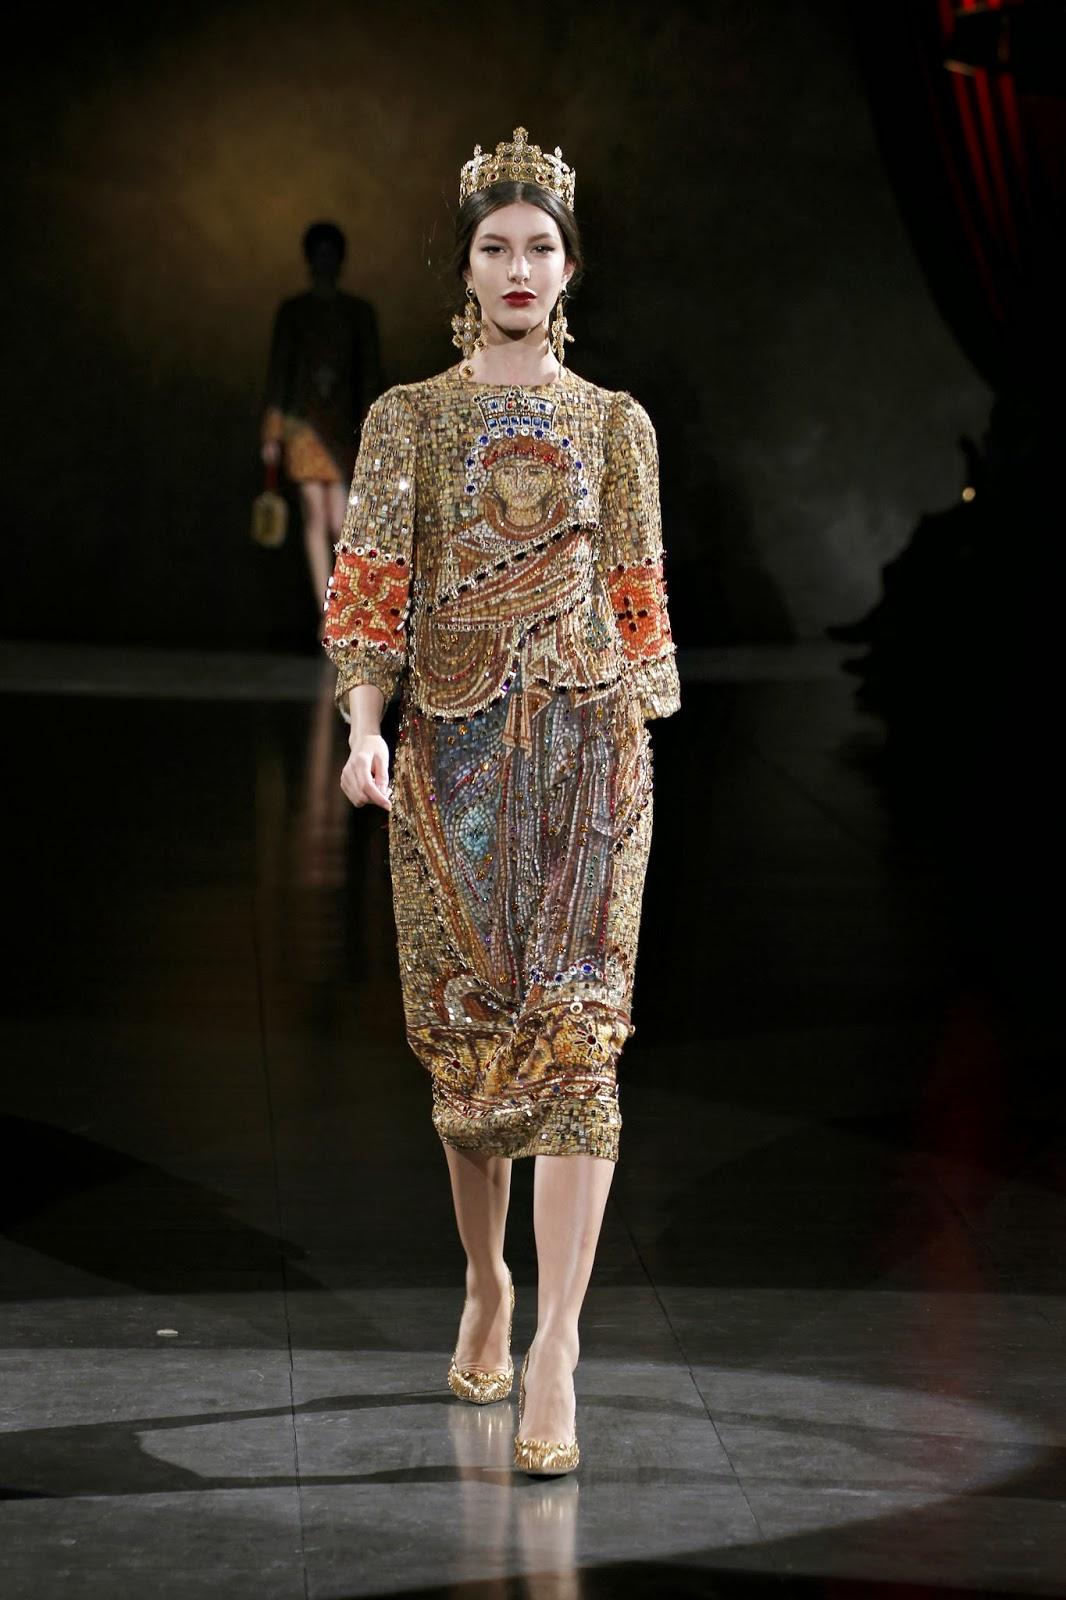 Multimayway: Dolce & Gabbana In Renaissance